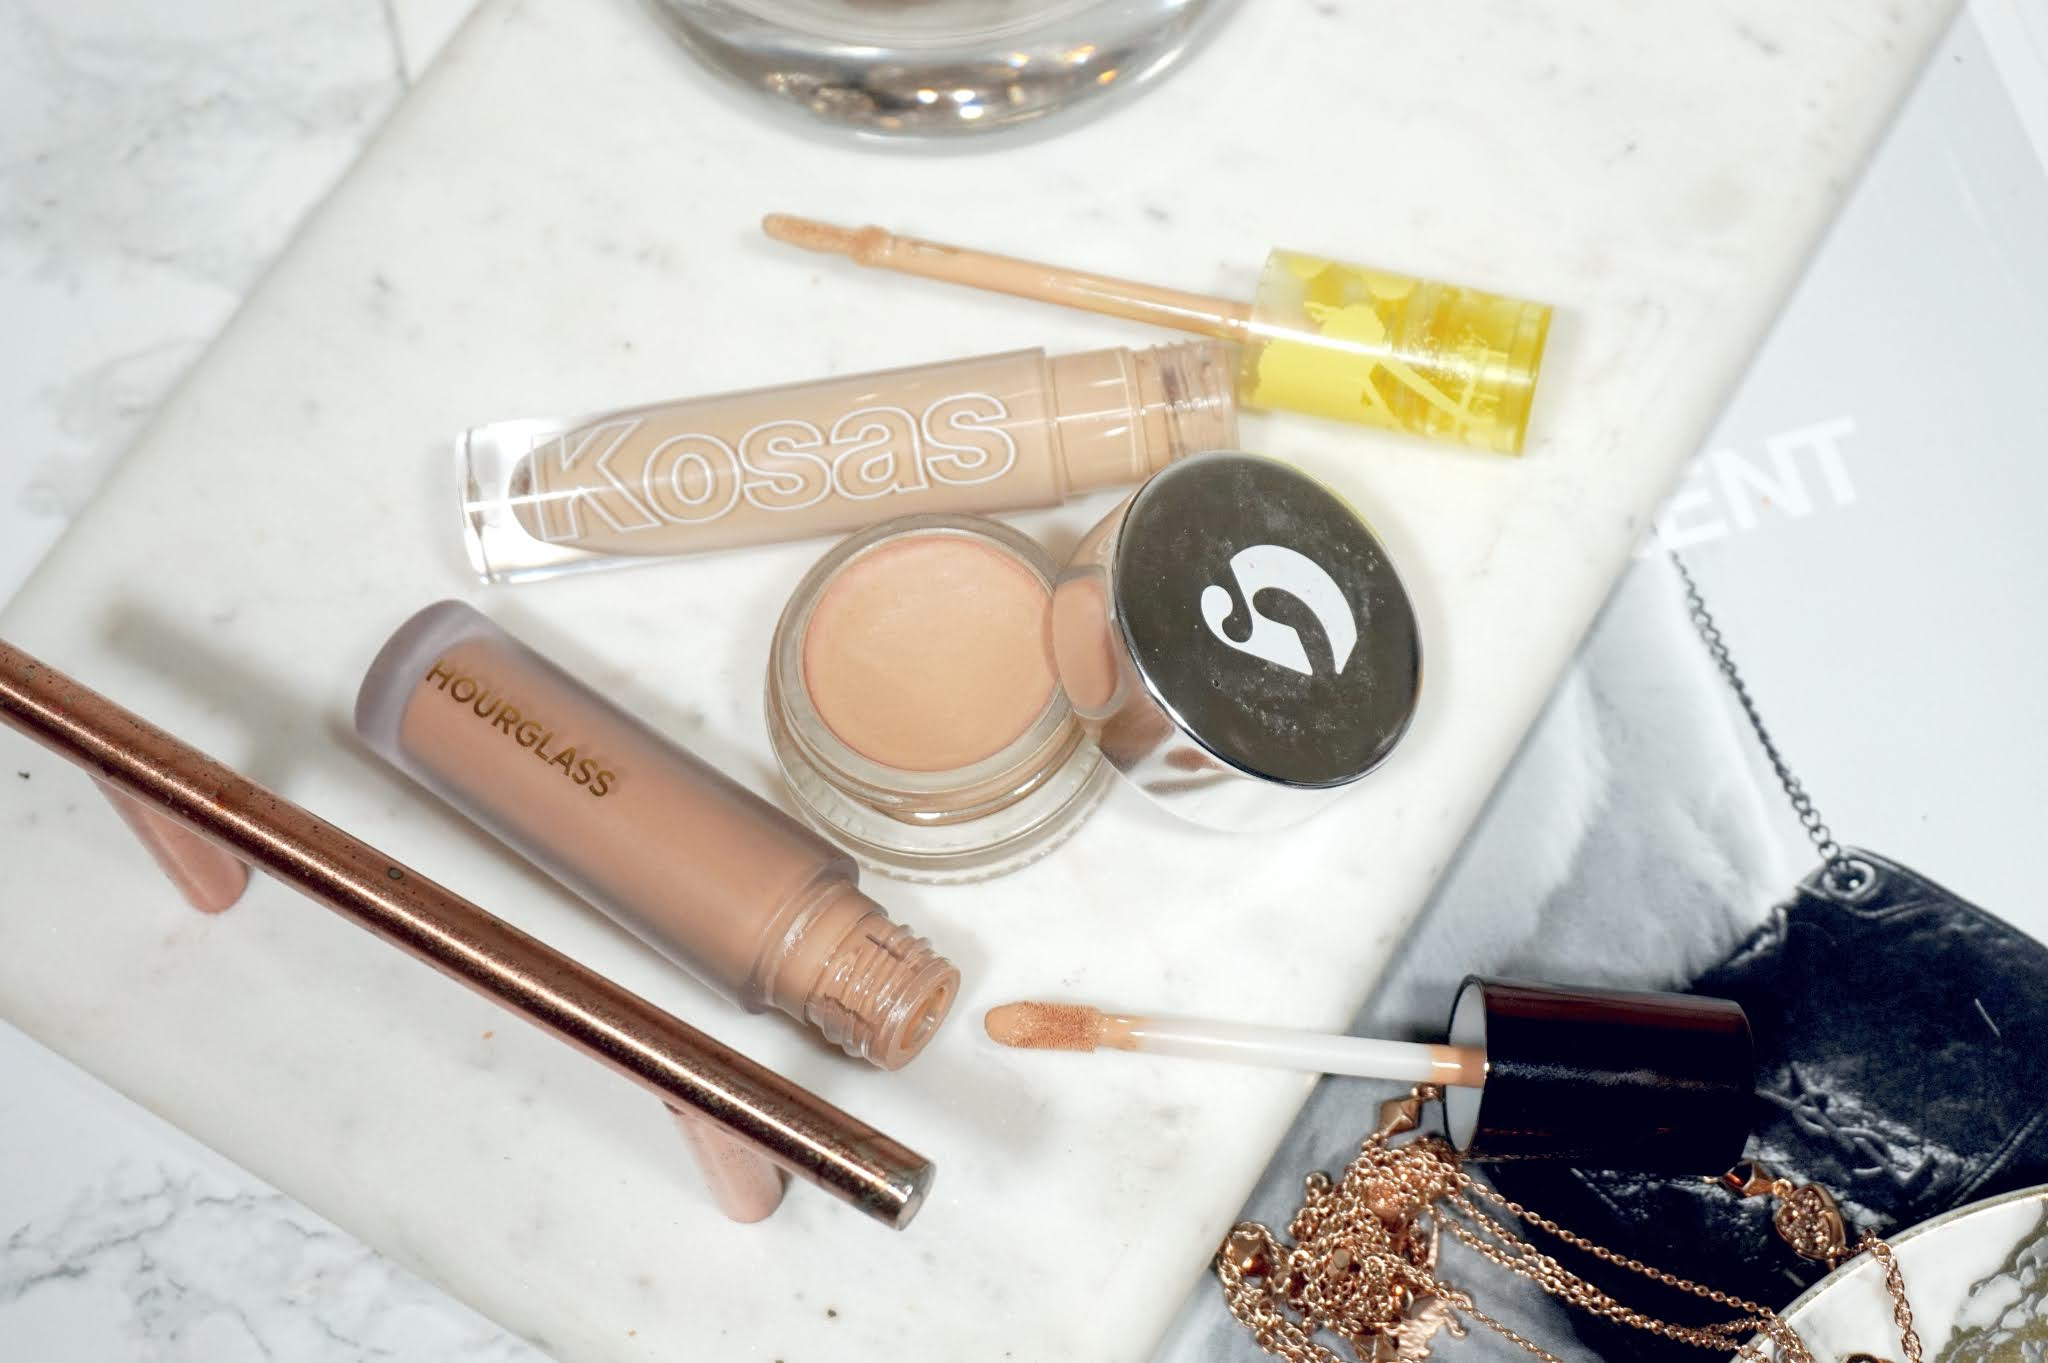 Best of Beauty 2020 - Makeup